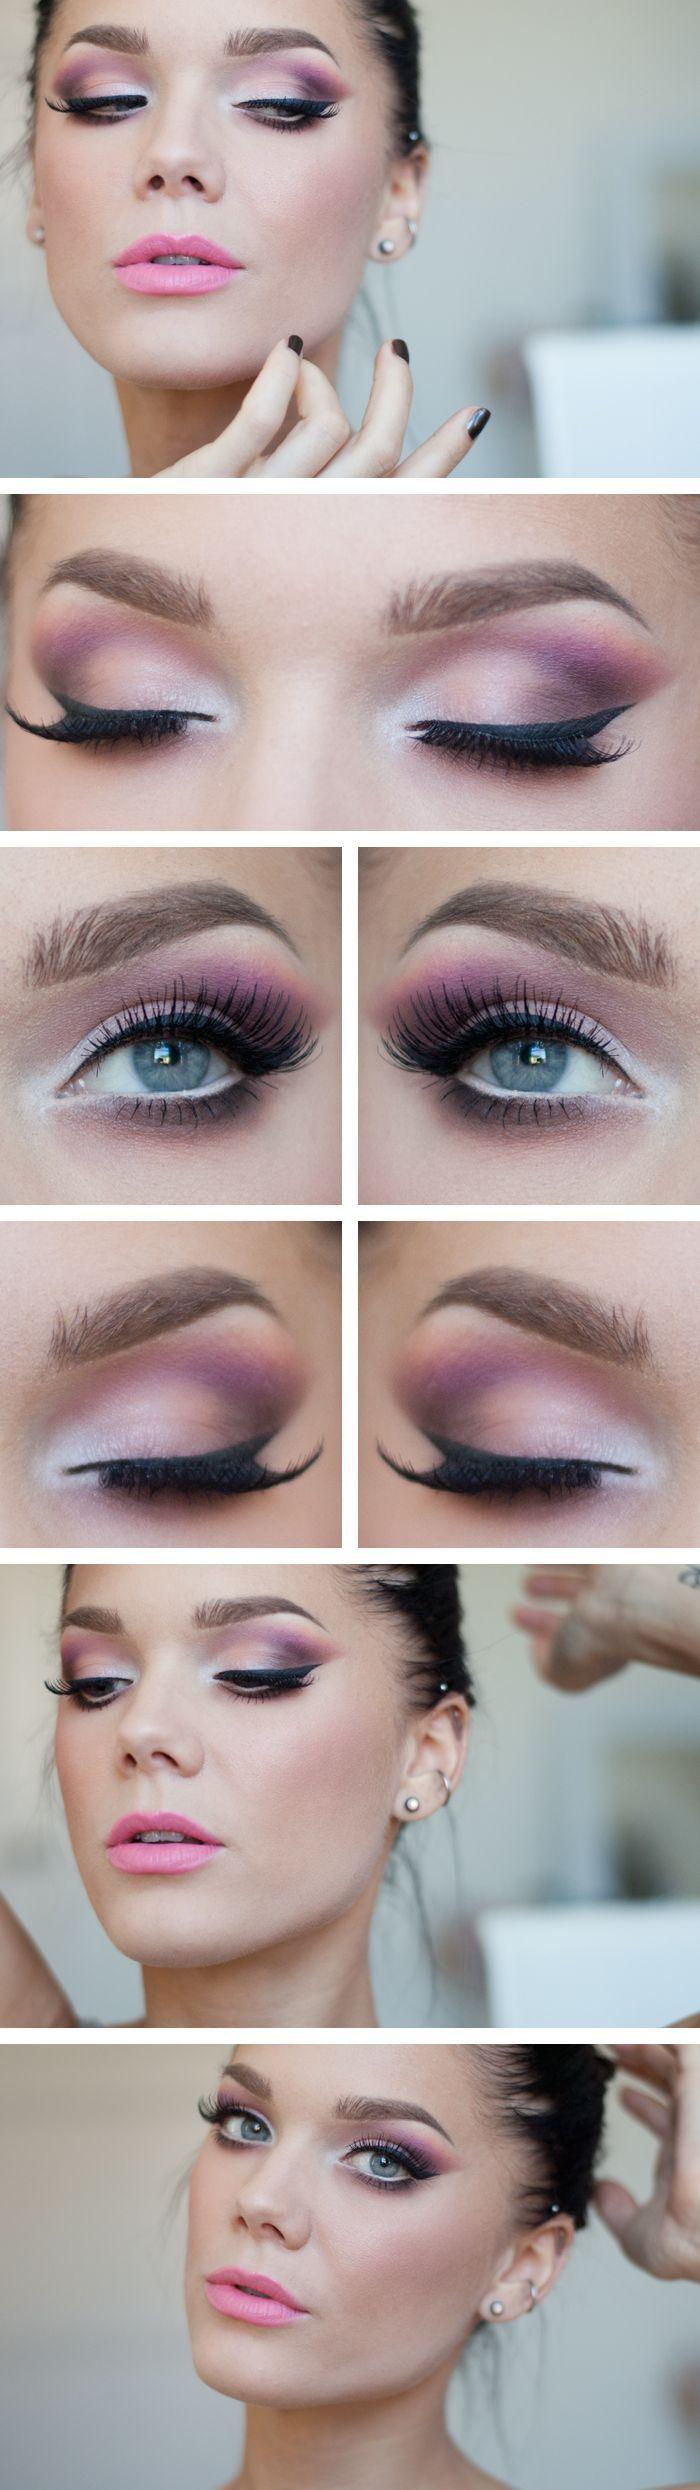 Pink eyeshadow tutorials